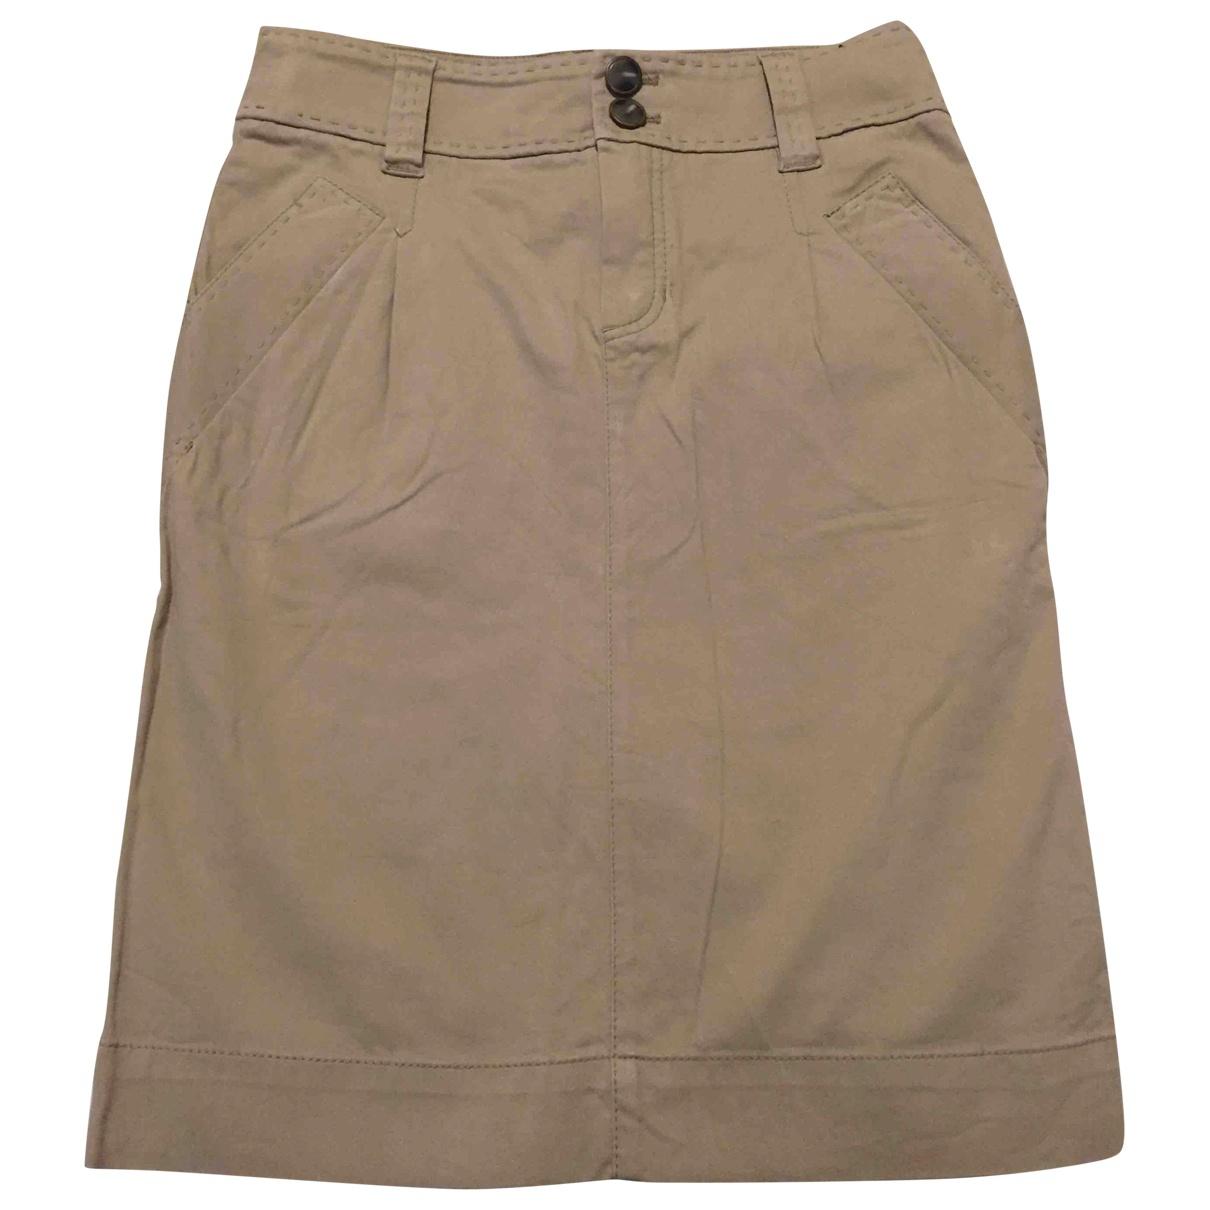 Massimo Dutti - Jupe   pour femme en coton - elasthane - beige